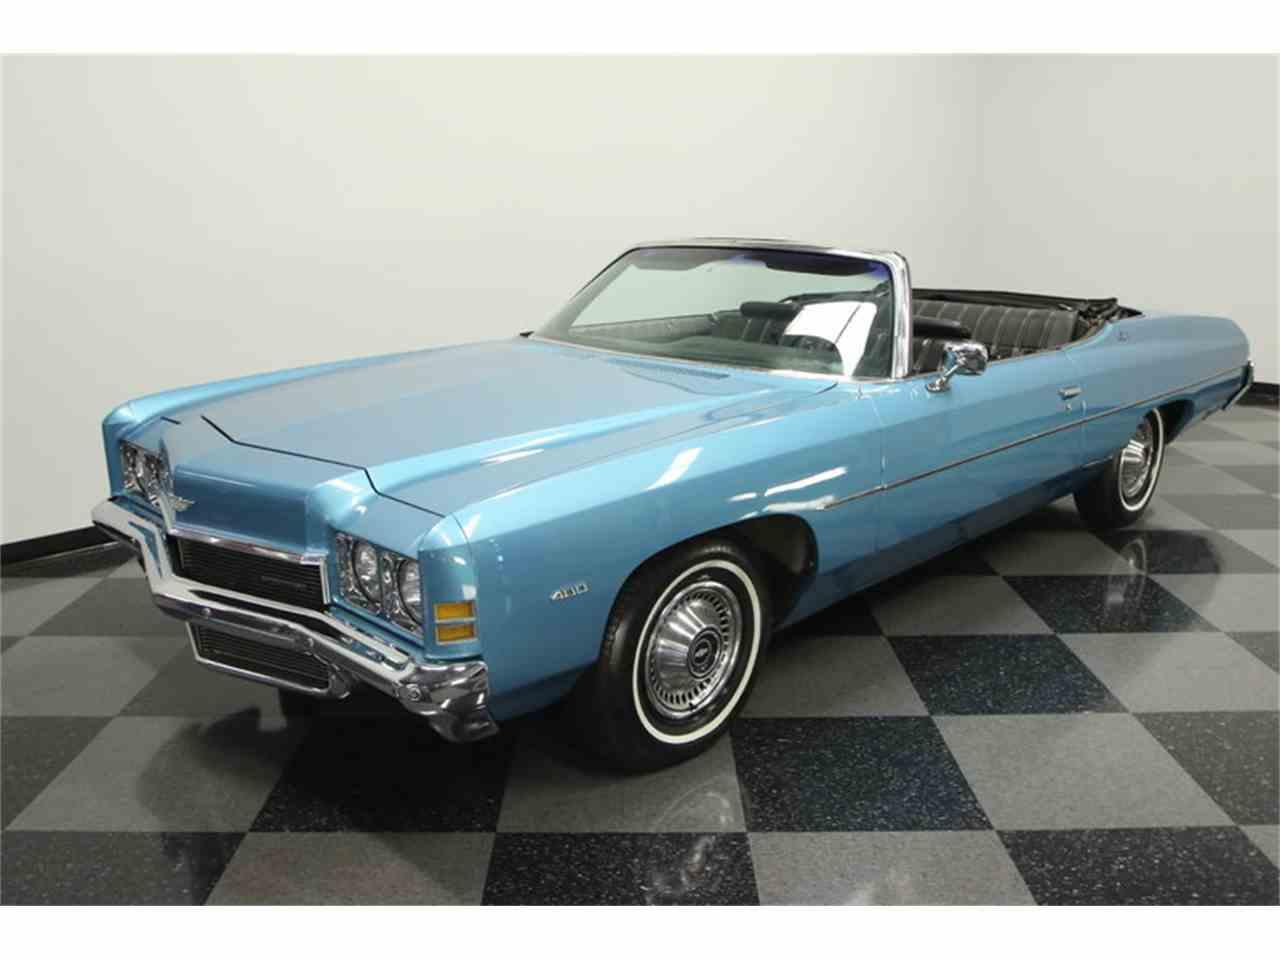 Impala 1972 chevrolet impala for sale : 1972 Chevrolet Impala for Sale | ClassicCars.com | CC-1016903